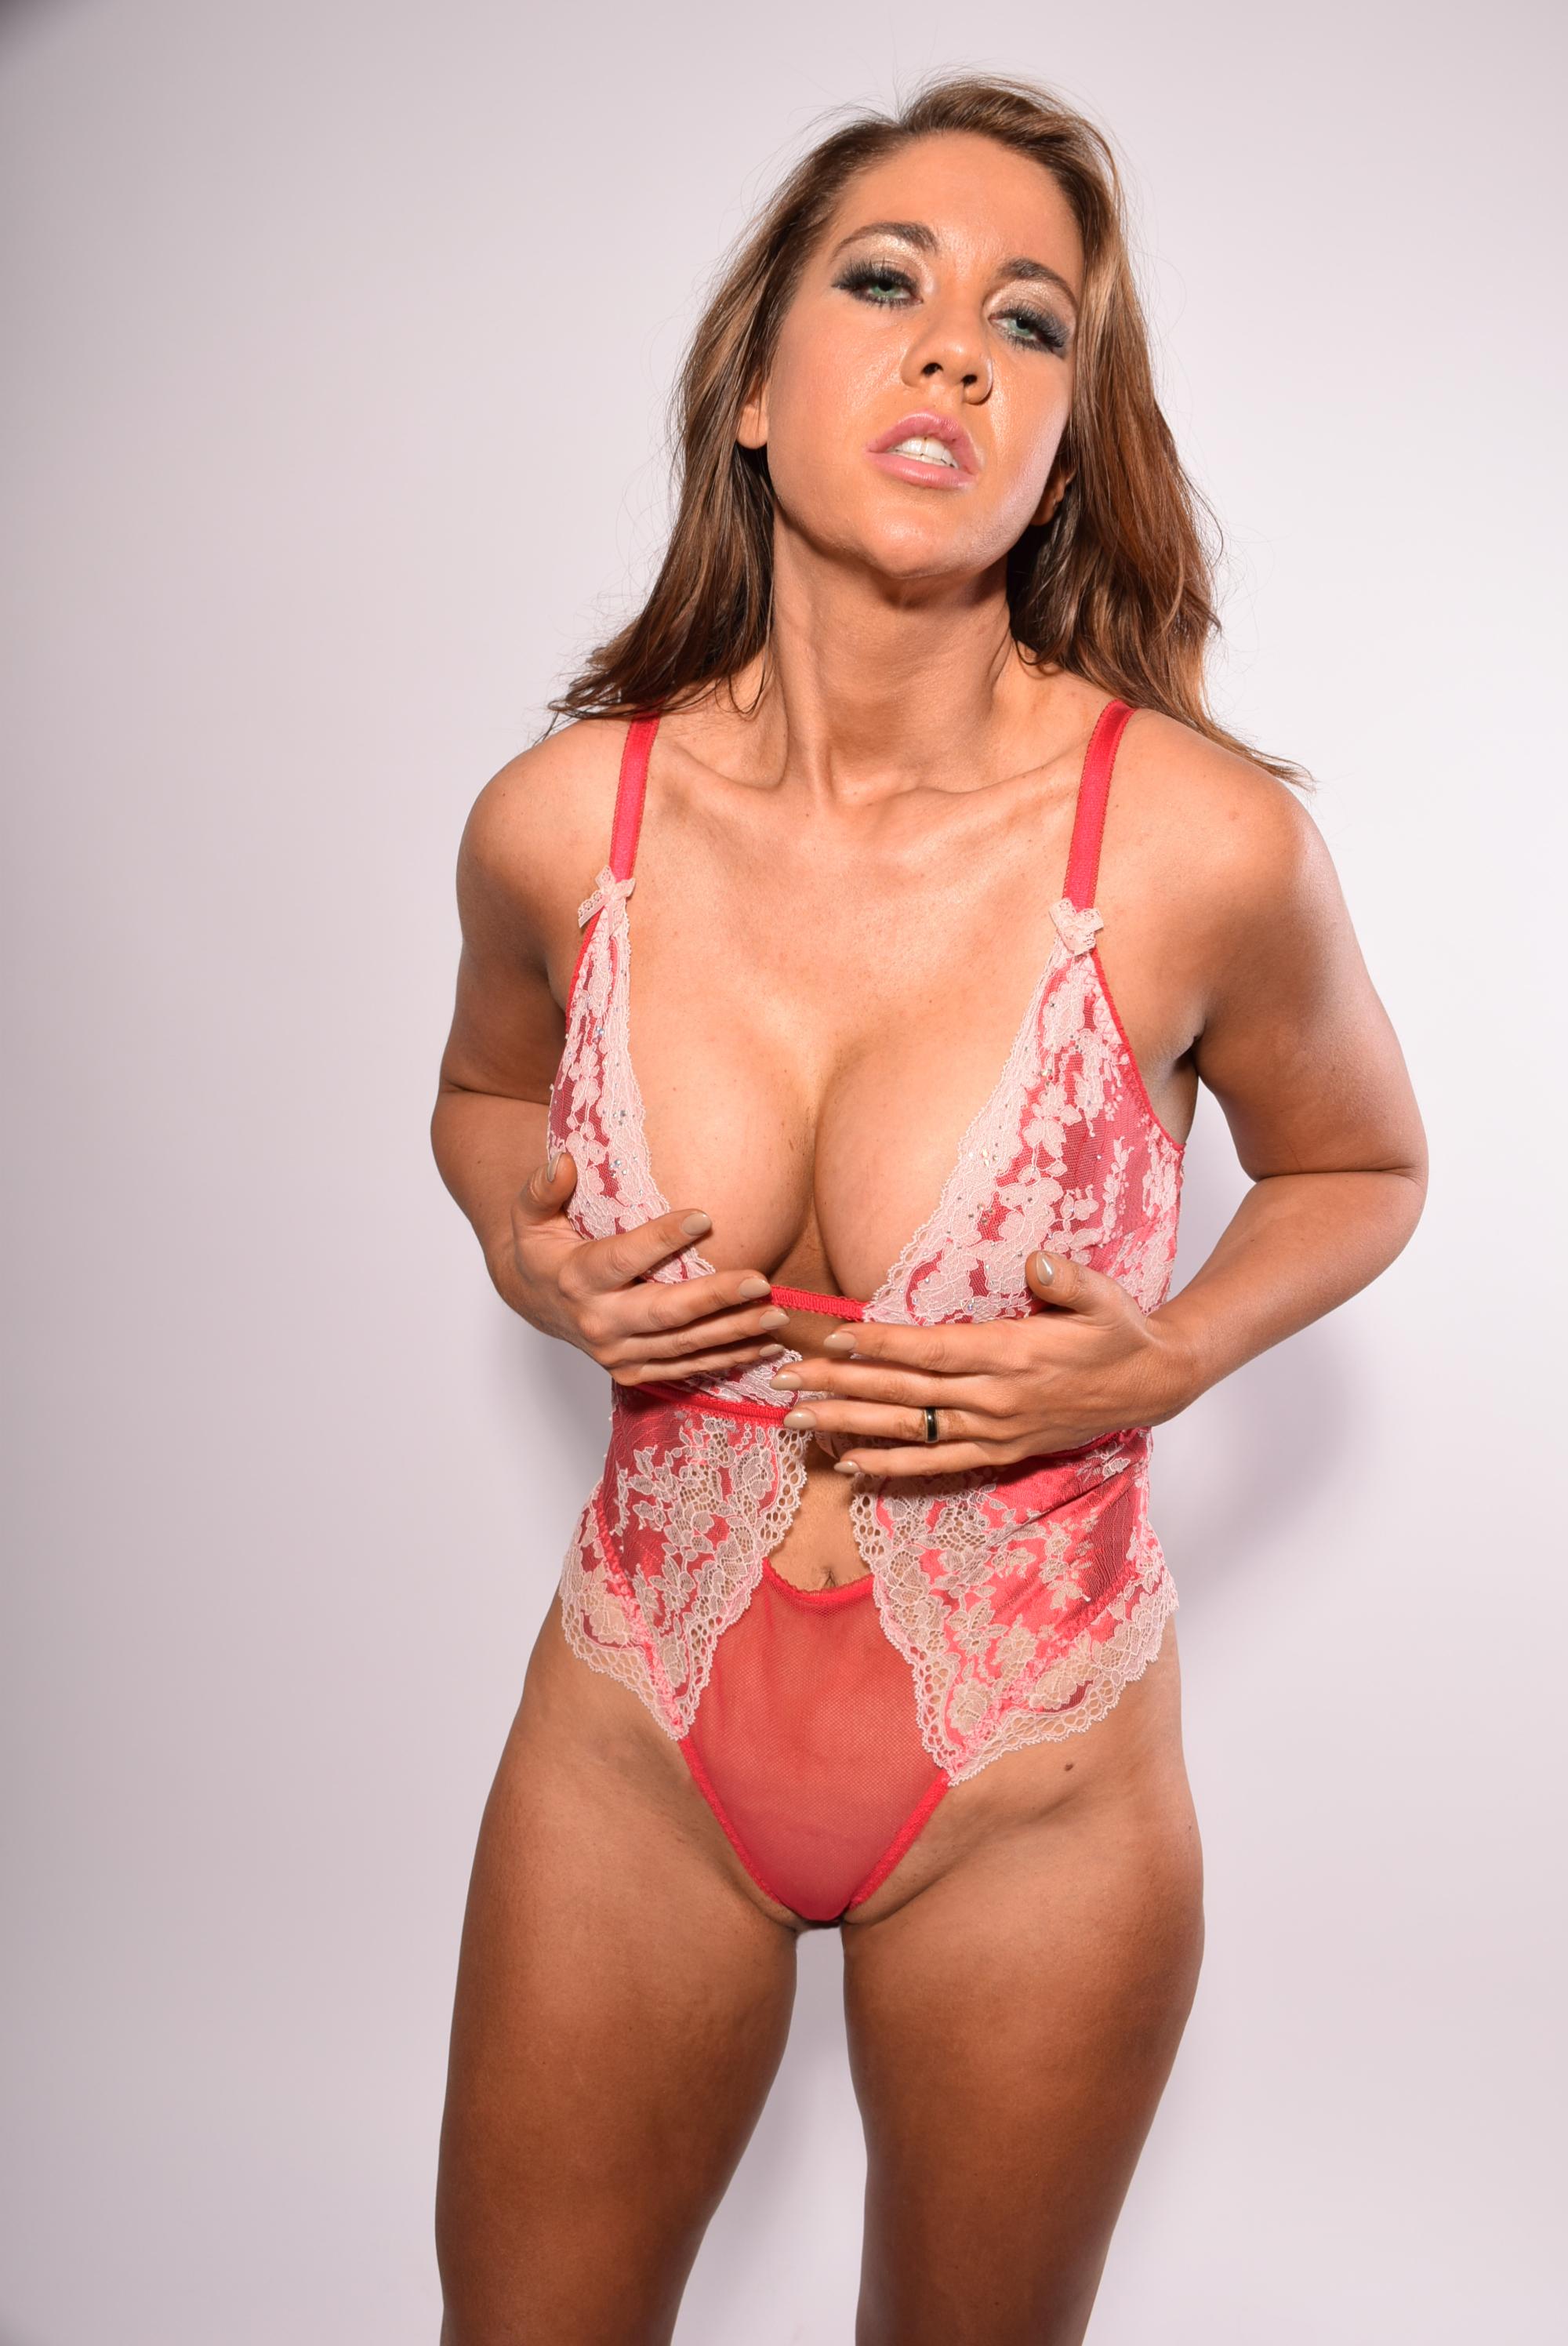 Rachel Lee Vonn